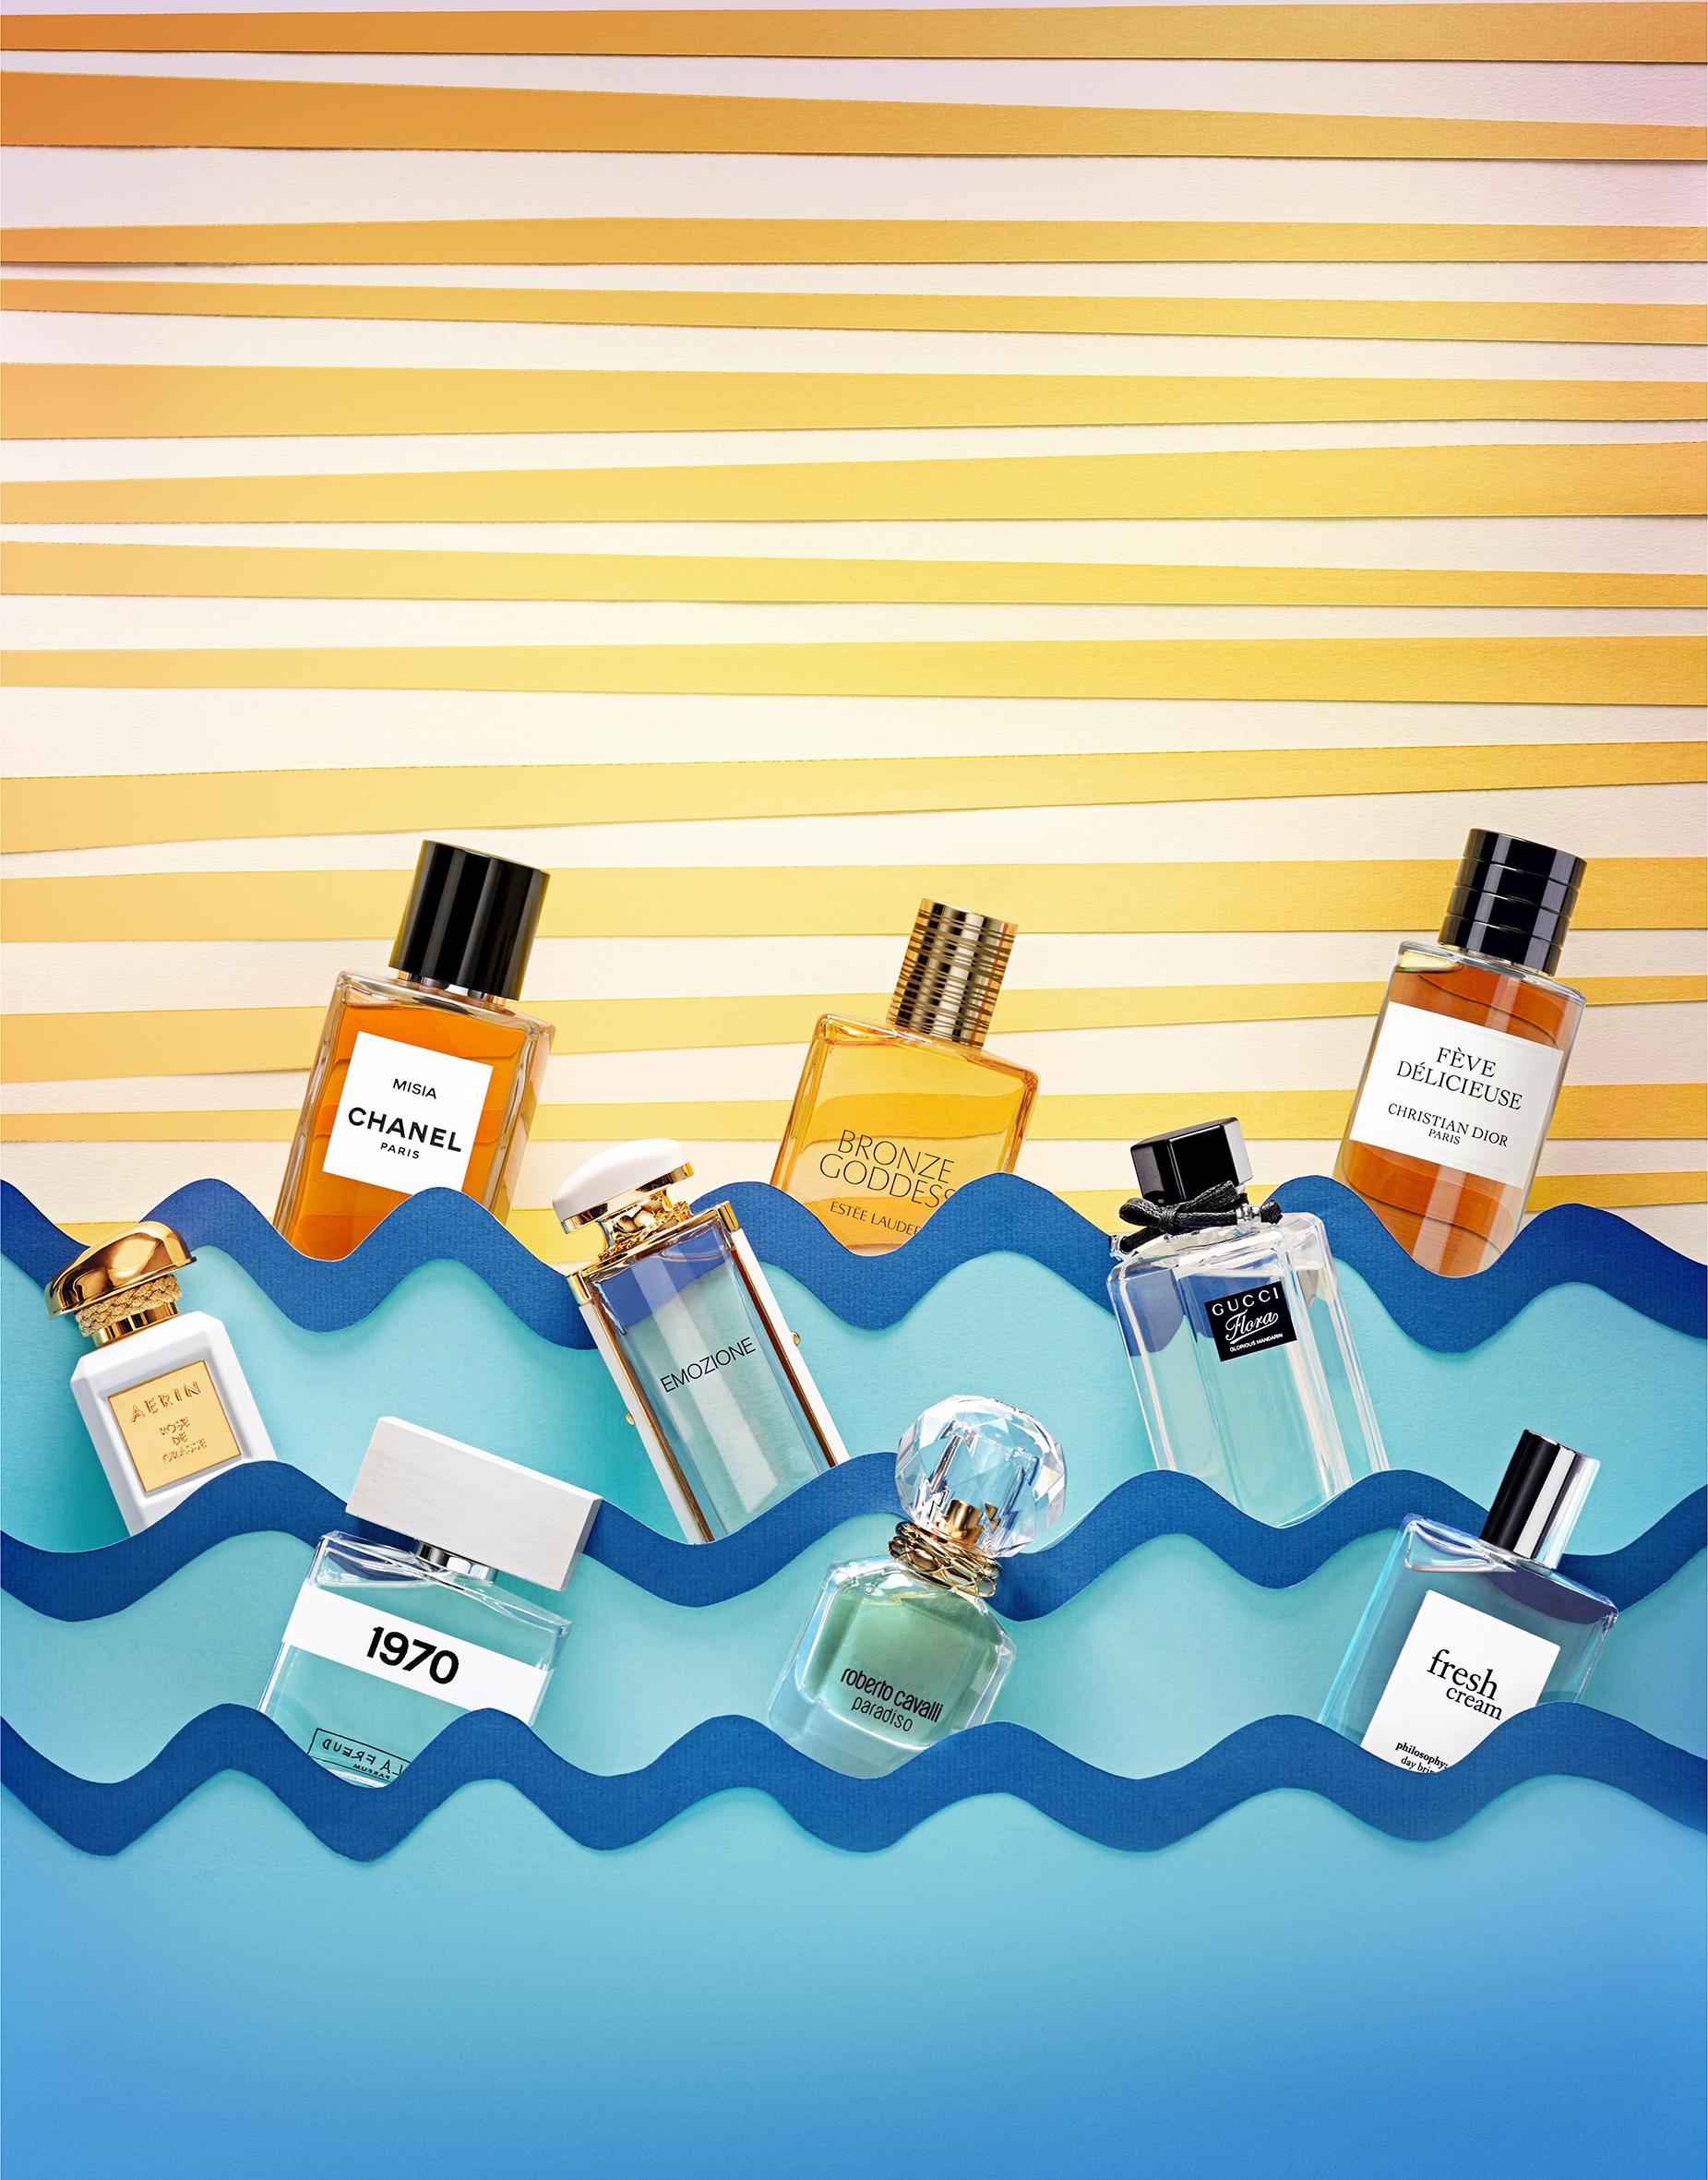 Tobi_J_ES-perfumes dropbox.jpg